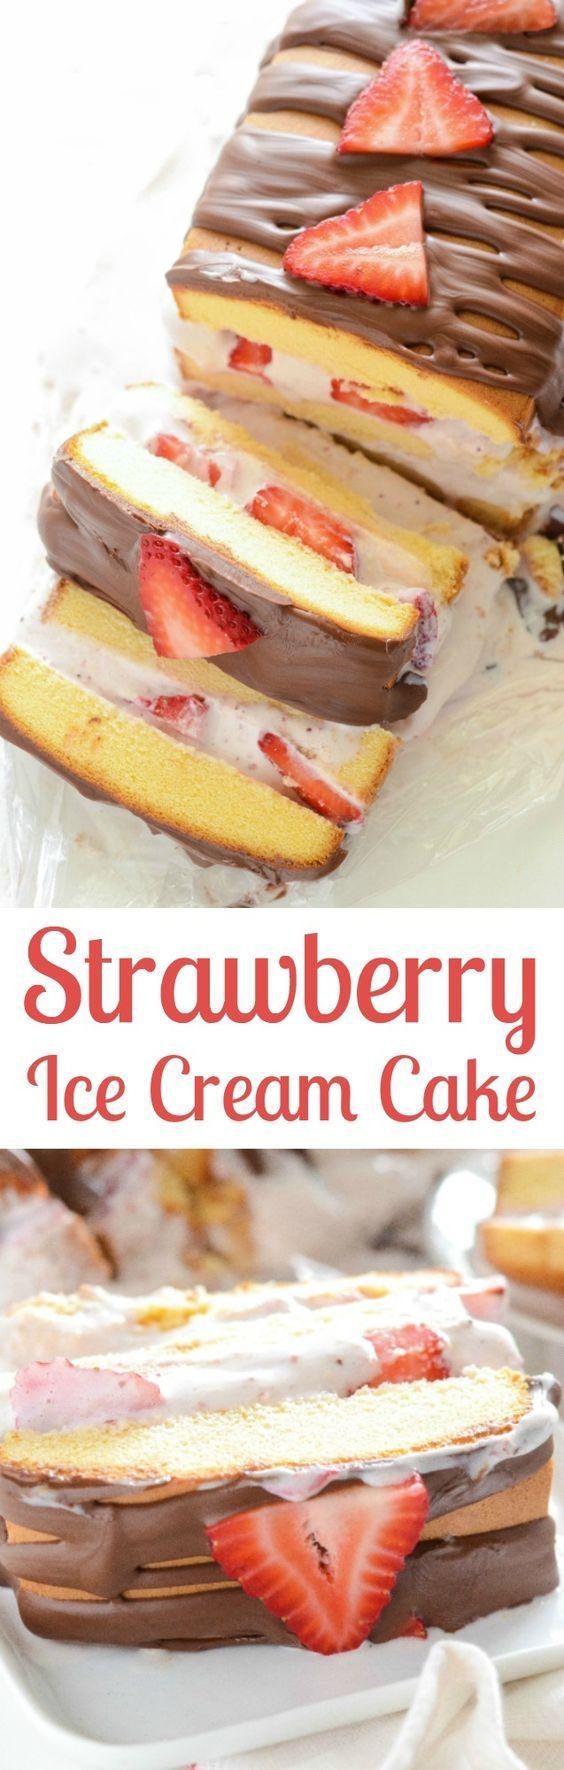 Strawberry Ice Cream Cake! An easy recipe using store bought pound cake, strawberry ice cream, fresh strawberries!